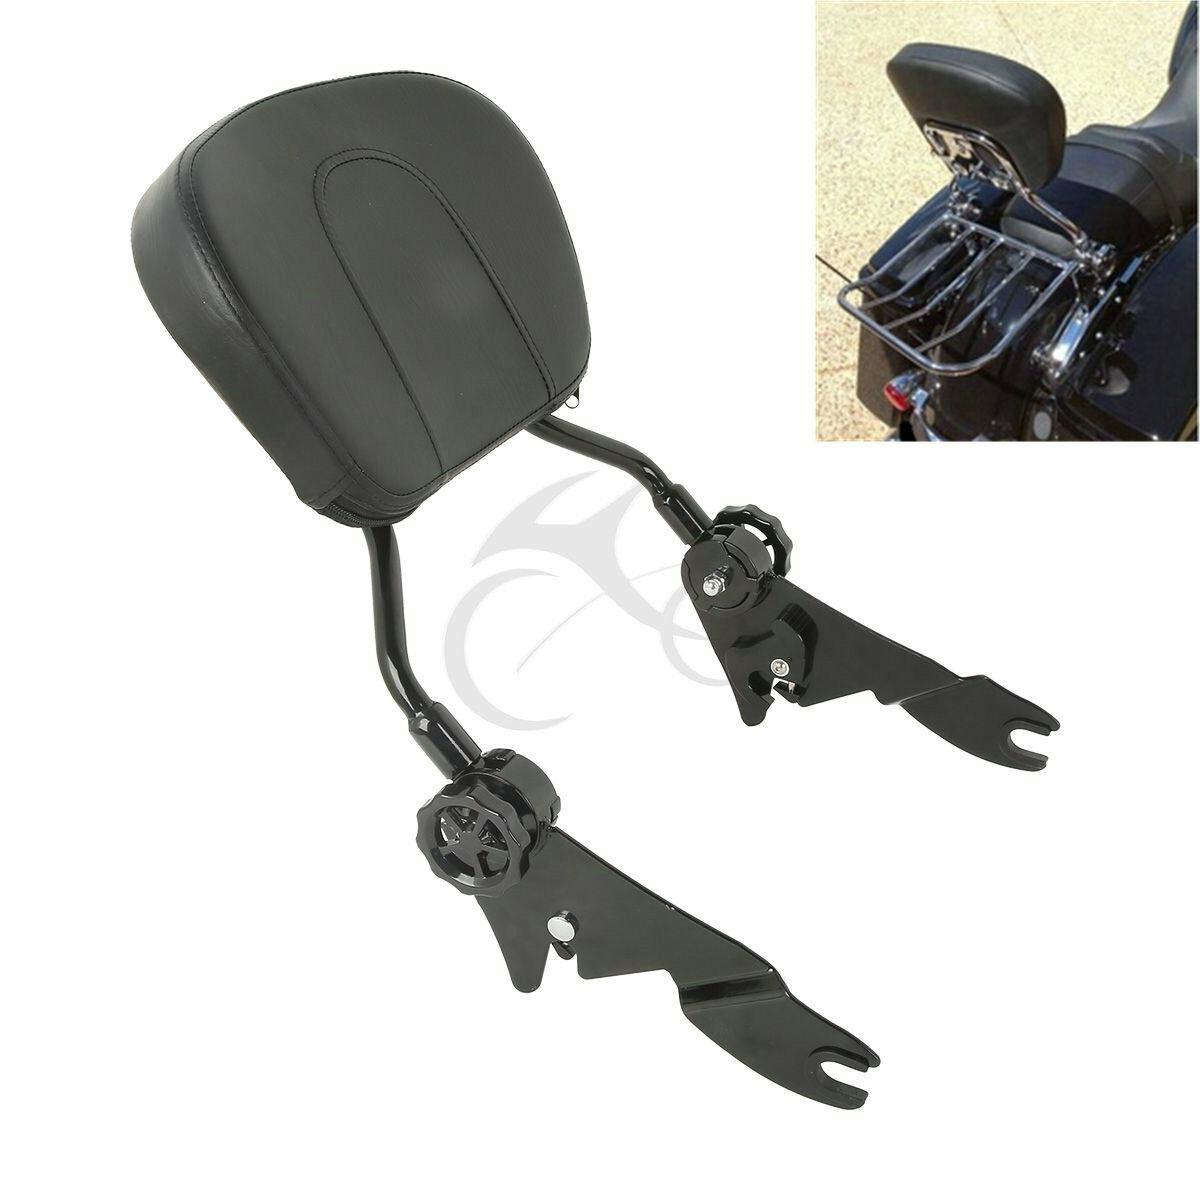 Motorcycle Black/Chrome Adjustable Sissy Bar Passenger Backrest W/ Pad For Harley Touring Models  Street Road Glide 2009+